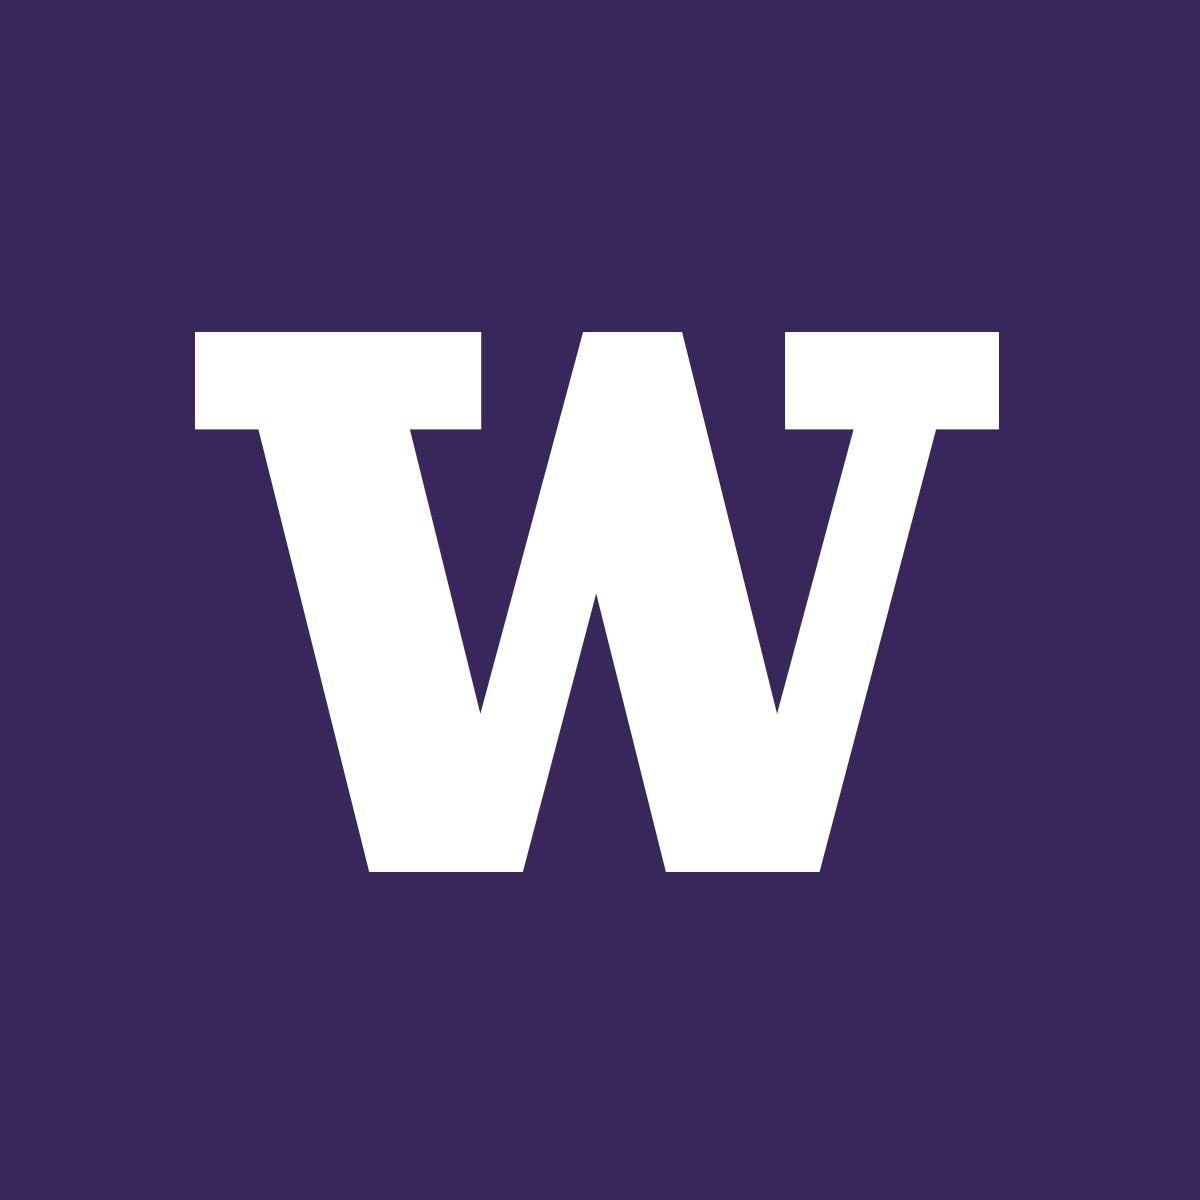 logo-1200x1200